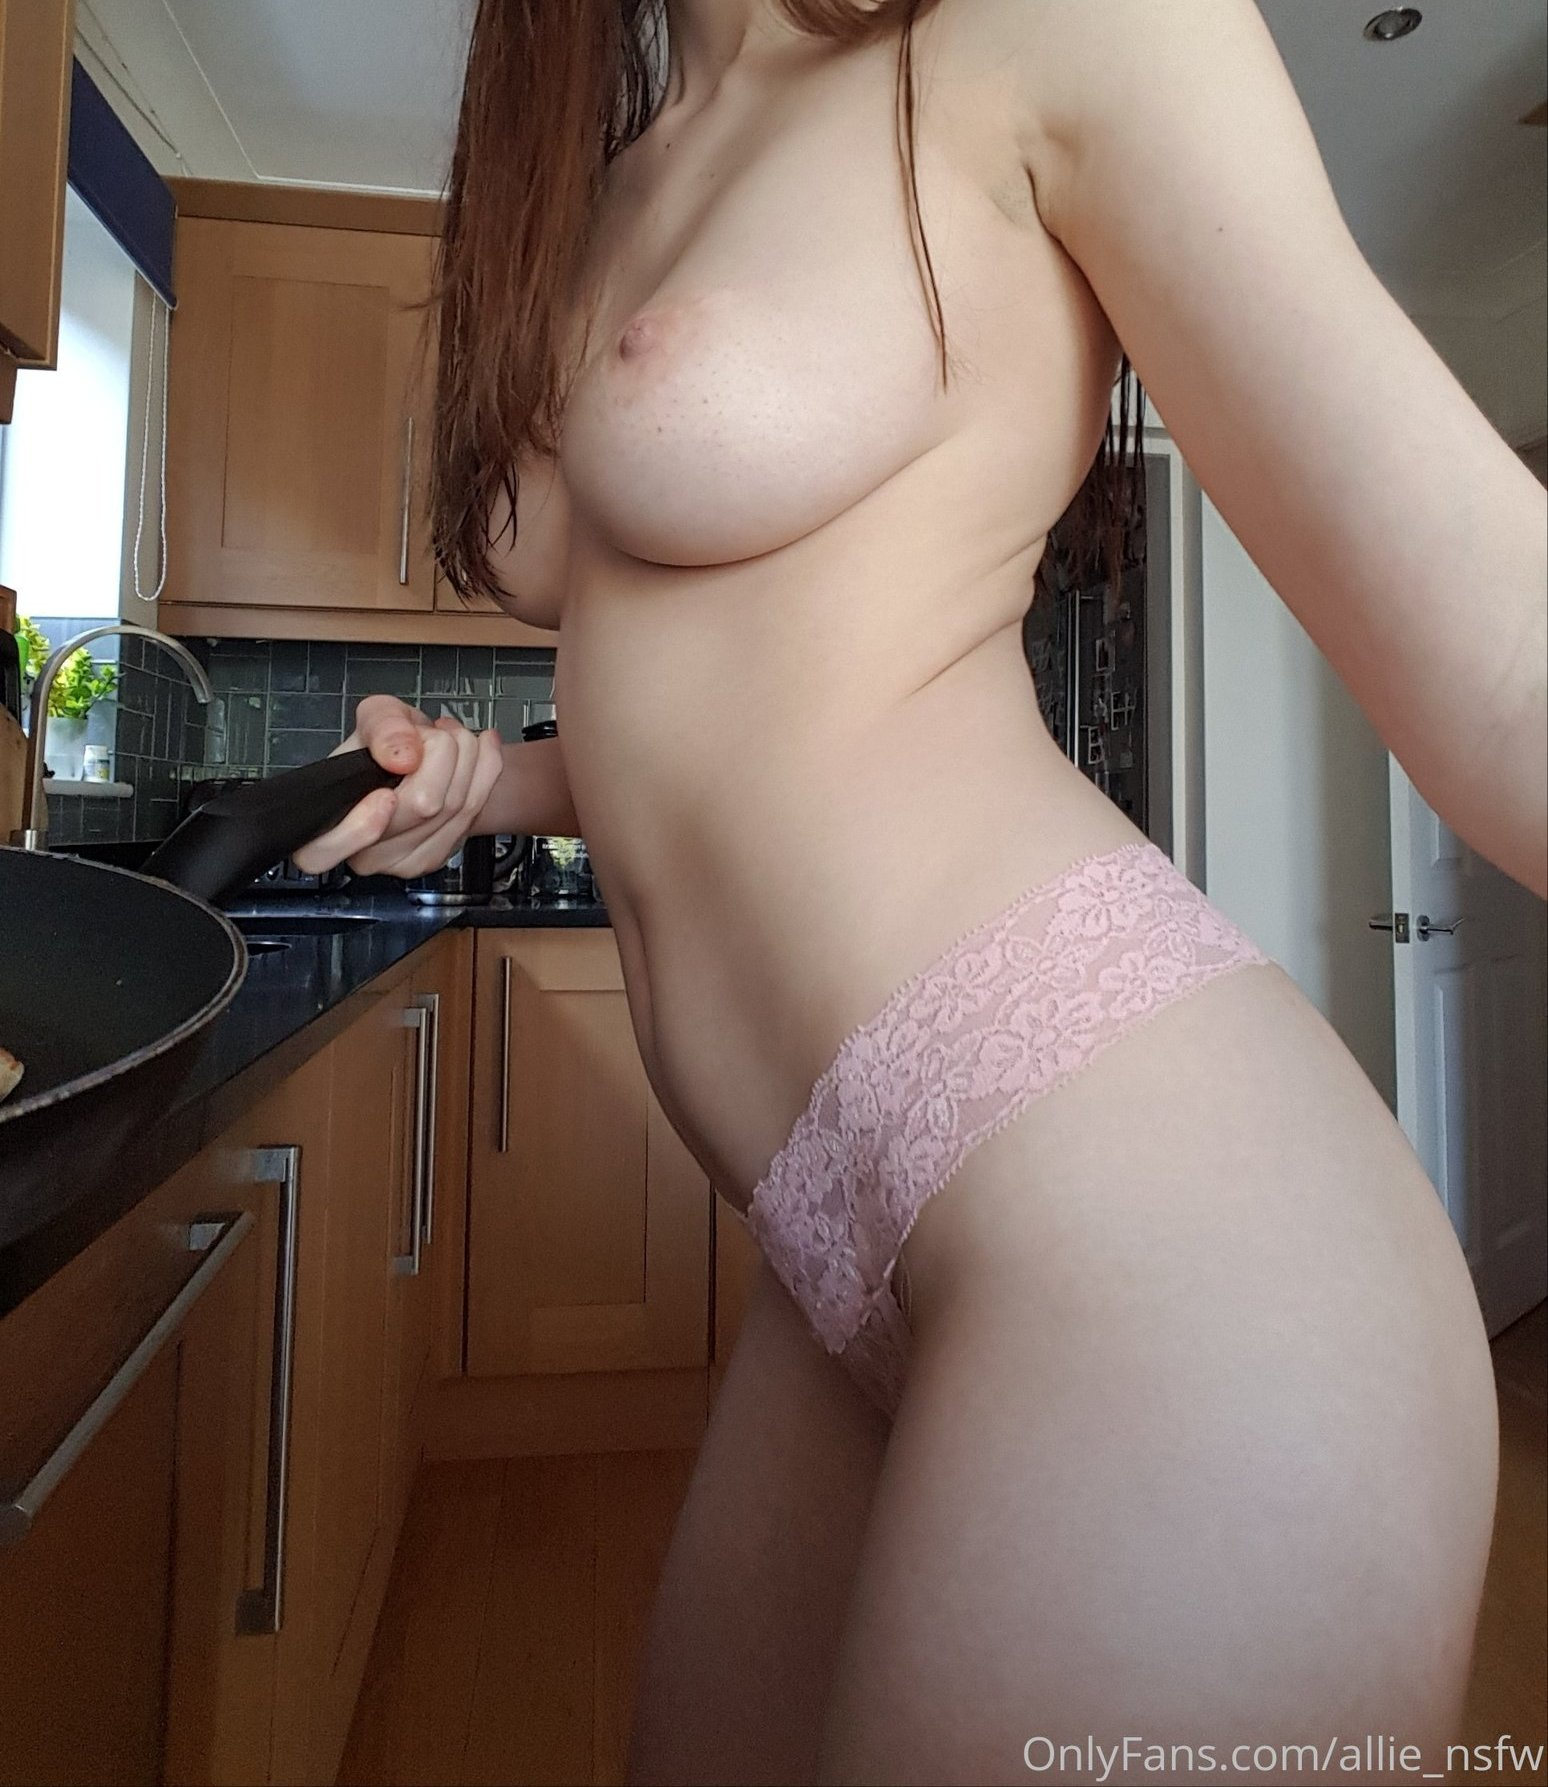 Allie Alliensfw Onlyfans Nude Leaks 0032